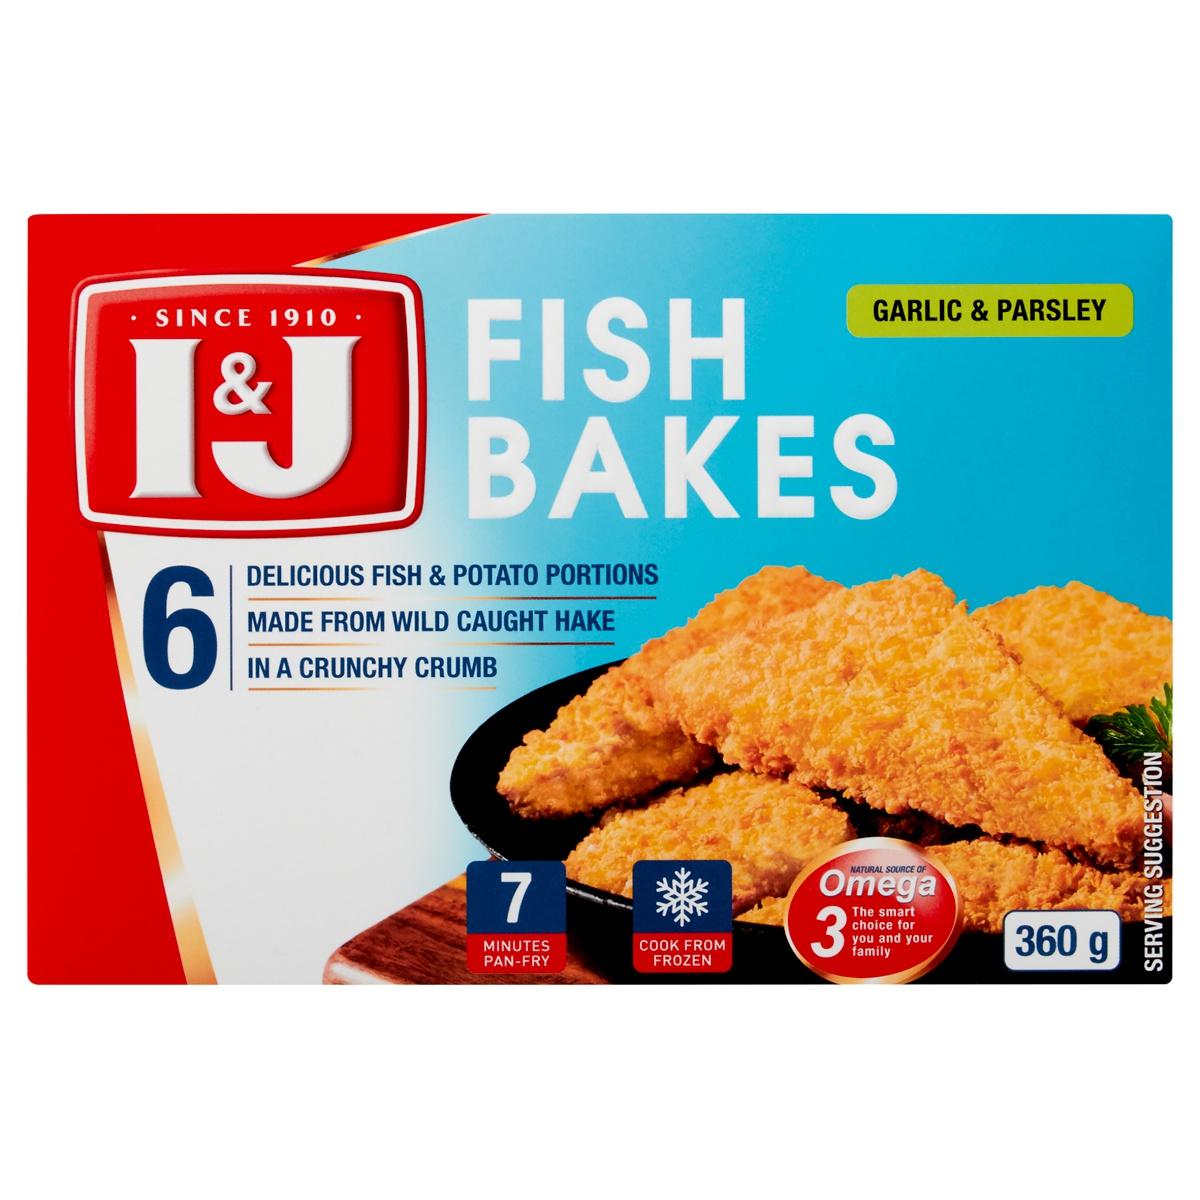 I&J FISH BAKE GARLIC 360GR